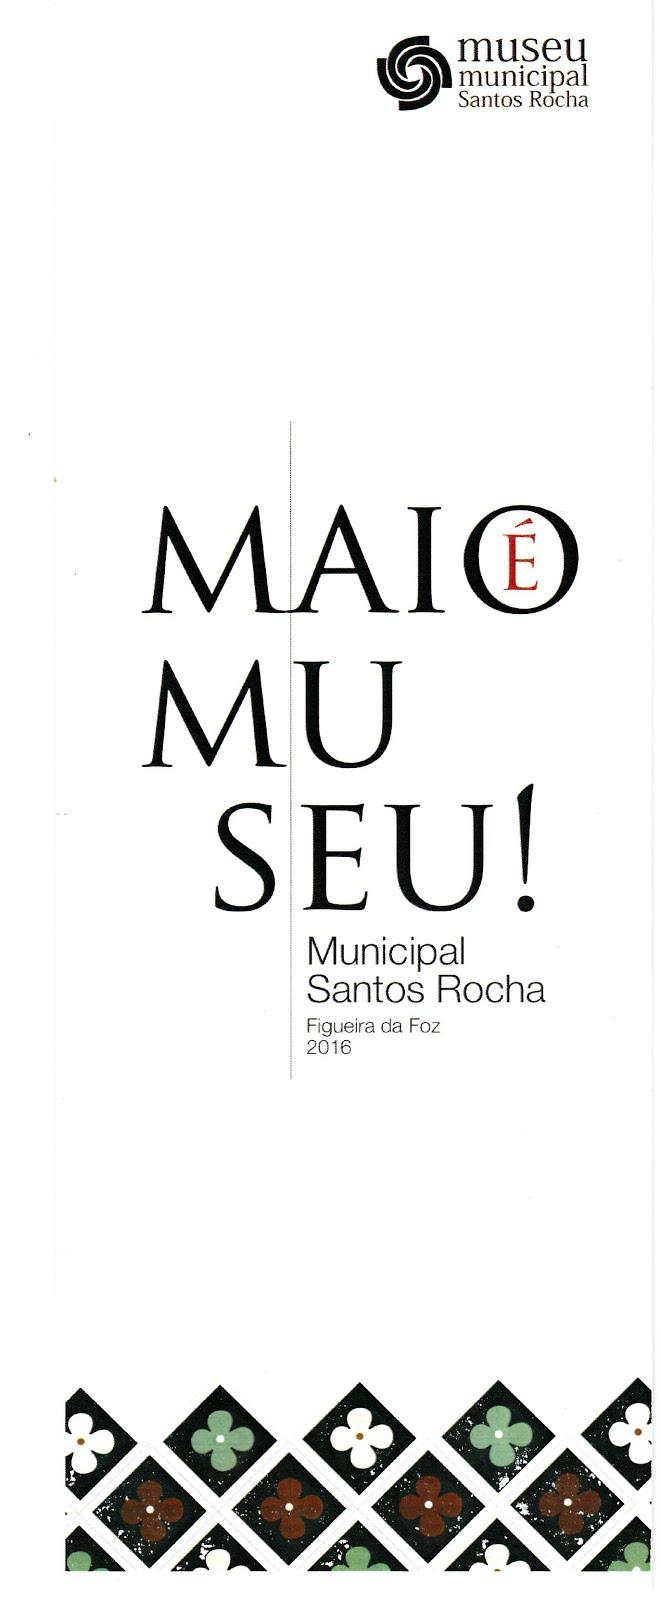 MAIO  MUSEU NA FIGUEIRA DA FOZ